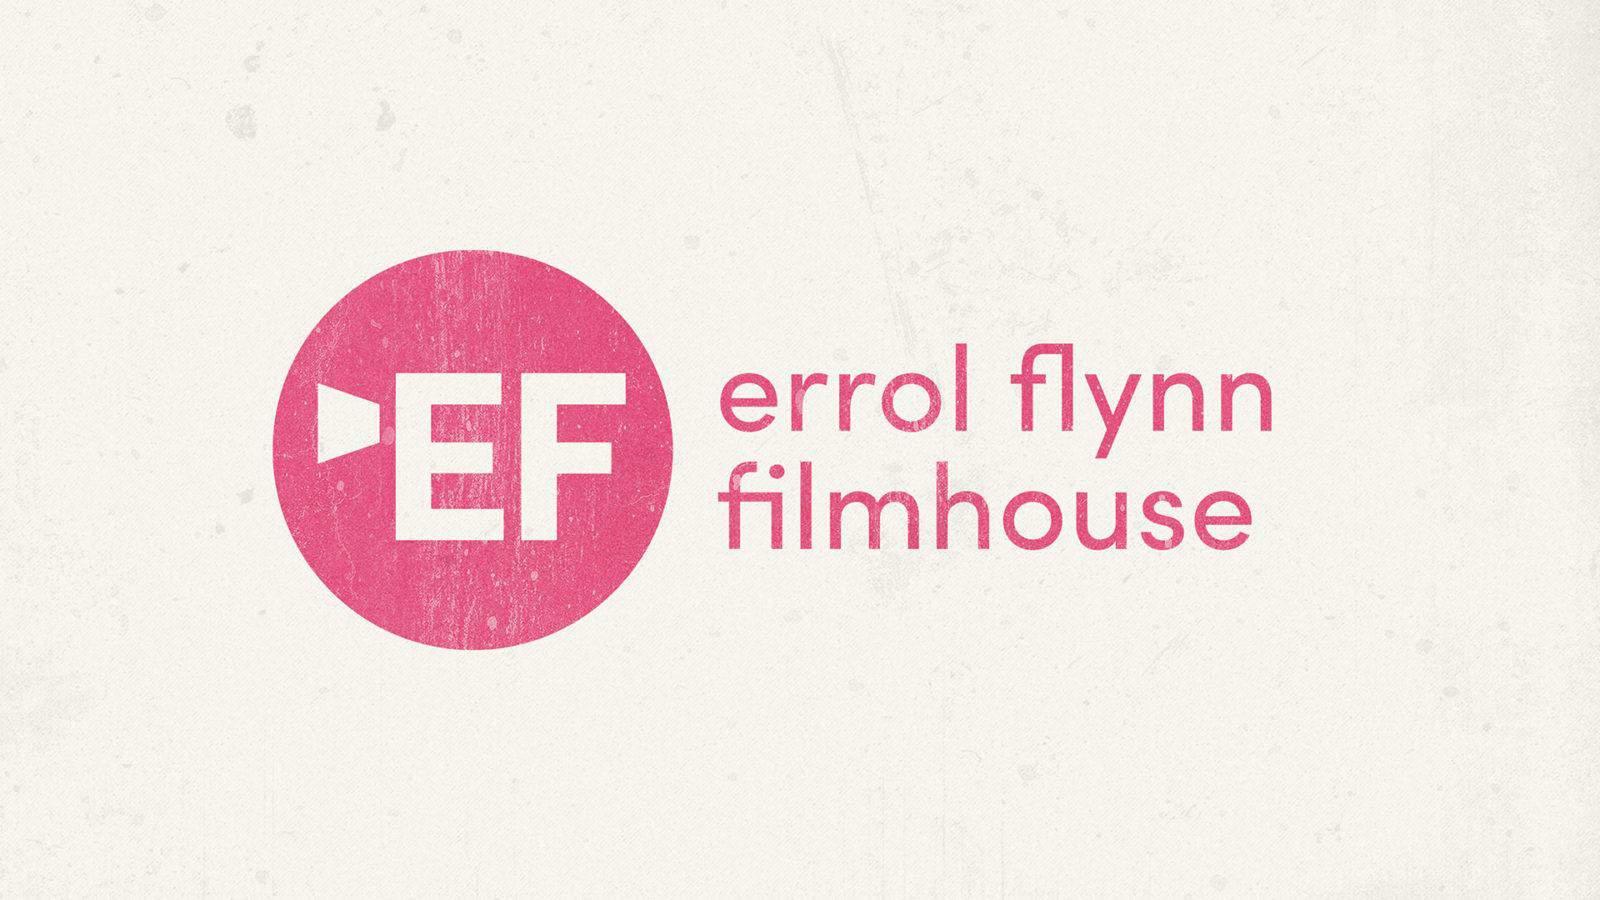 Royal & Derngate - Errol Flynn filmhouse logo branding